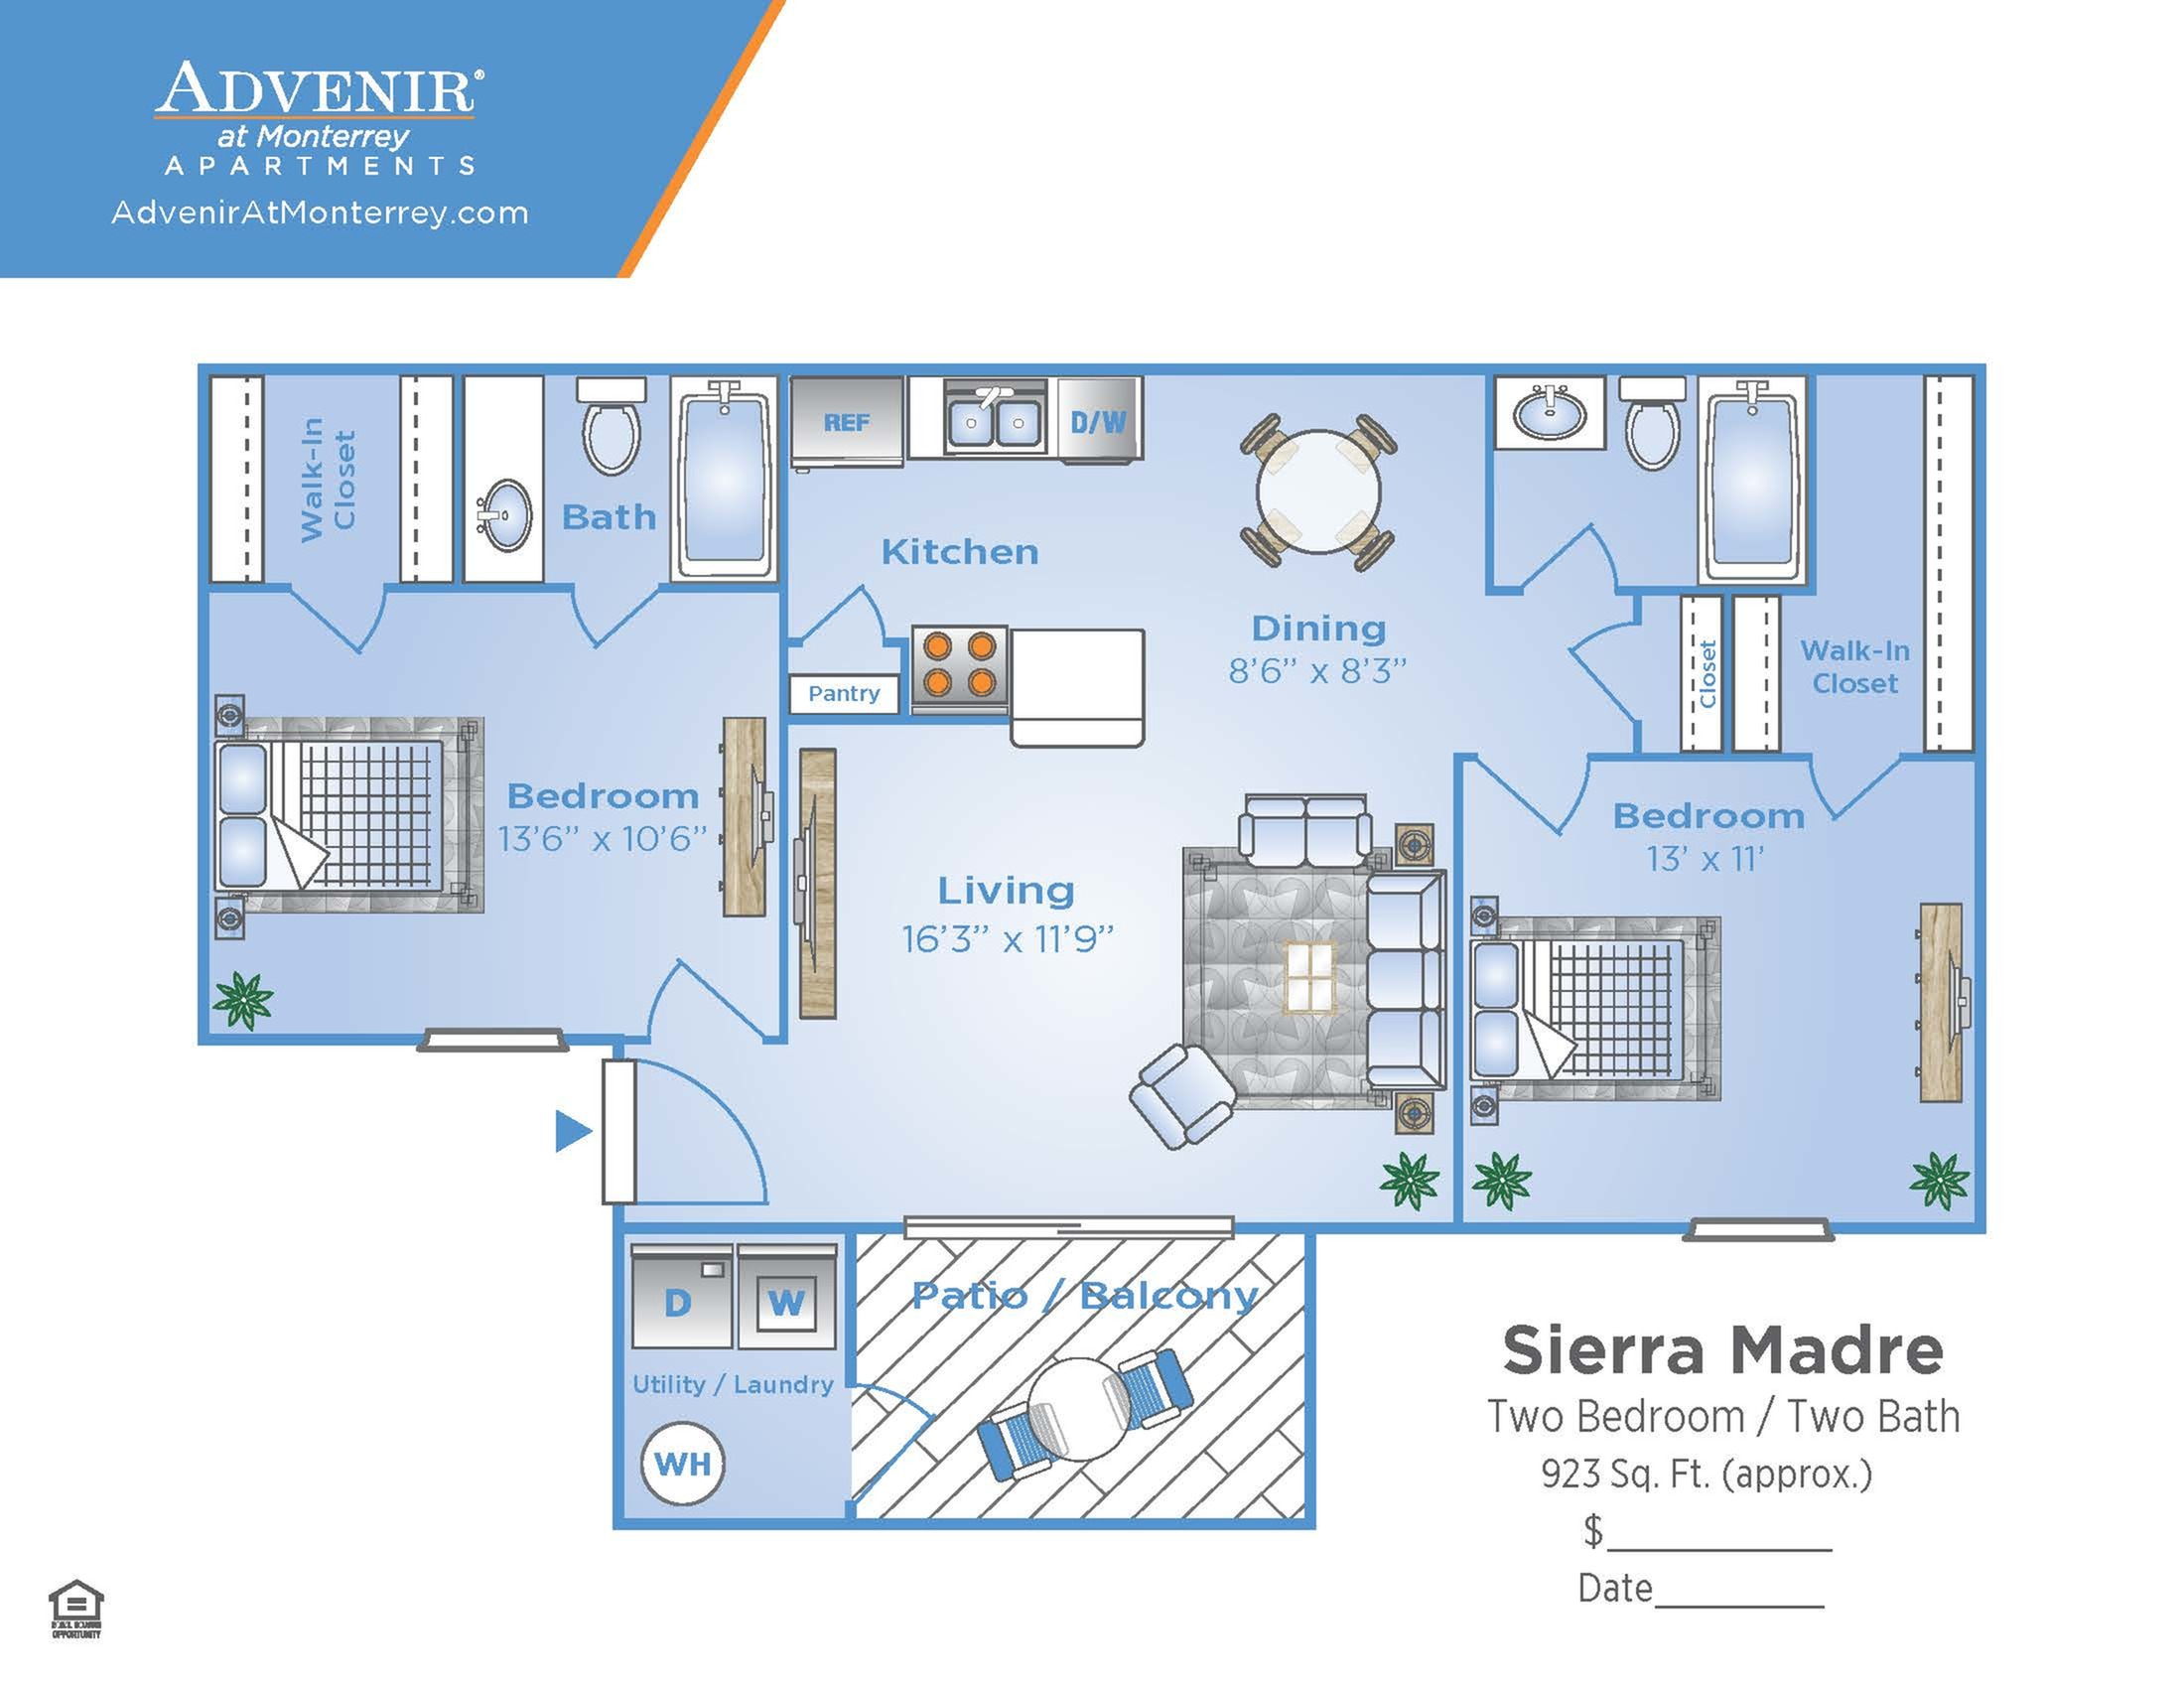 2 Bedroom Floor Plan | Venice Florida Apartments | Advenir at Monterrey